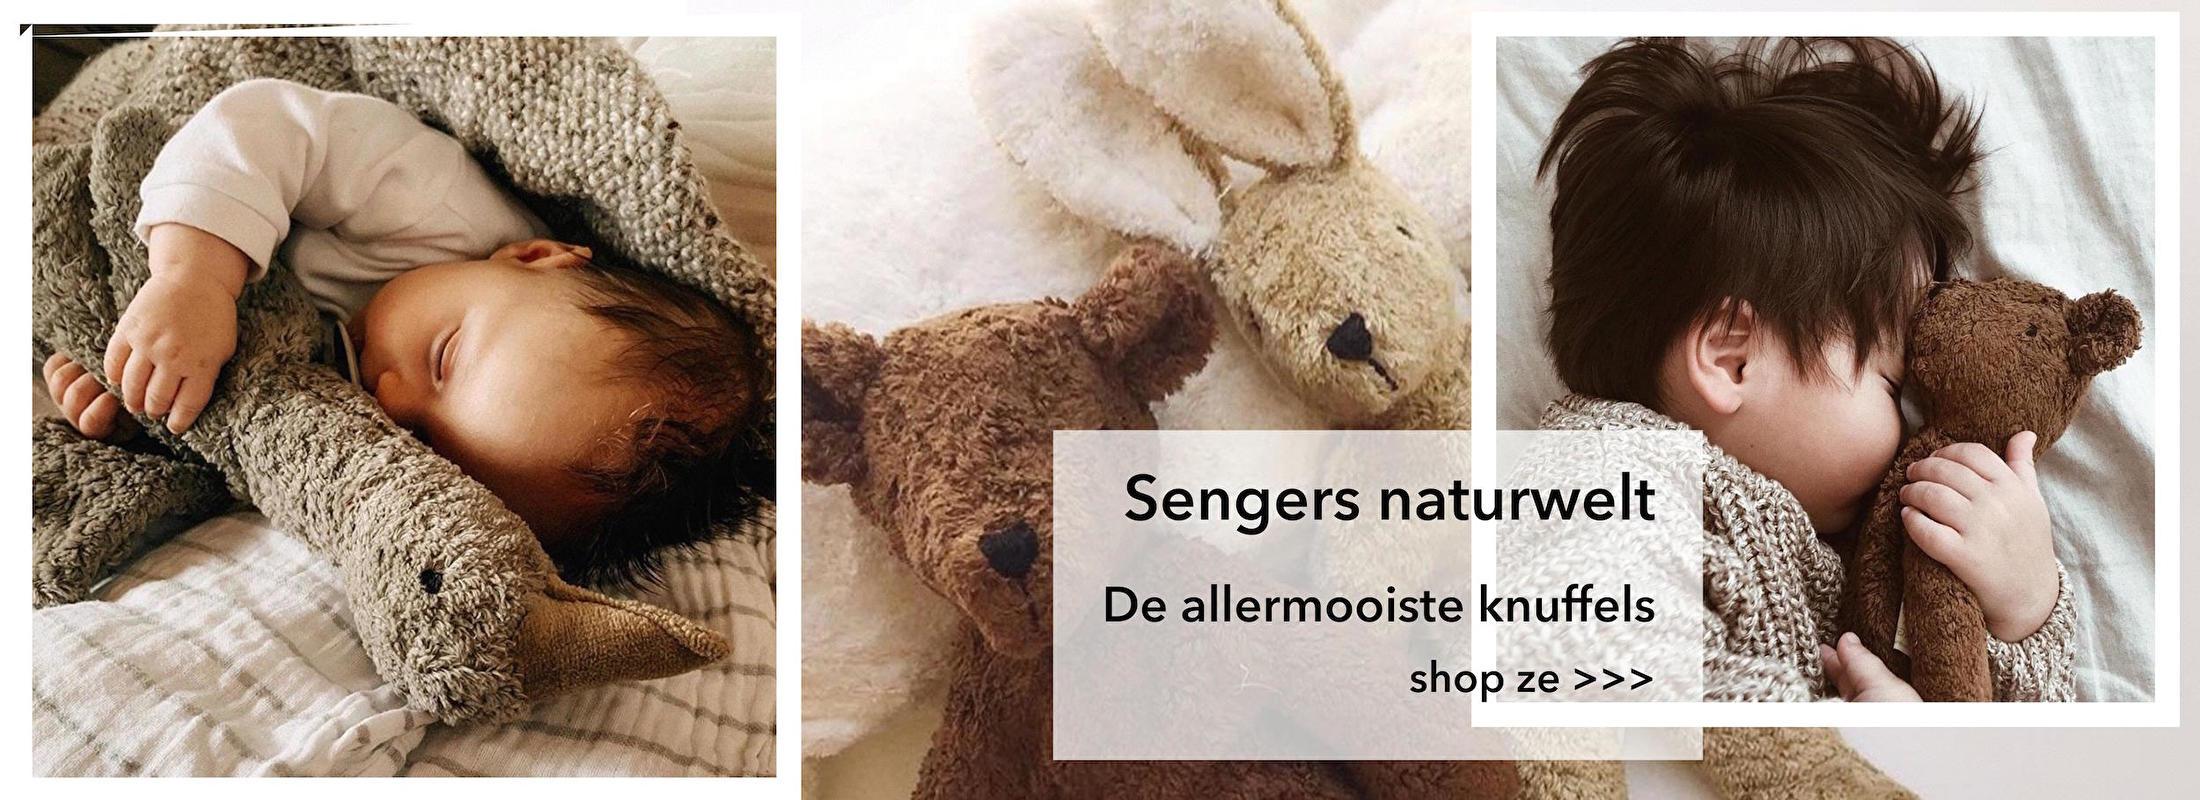 Sengers-naturwelt-mooie-knuffels